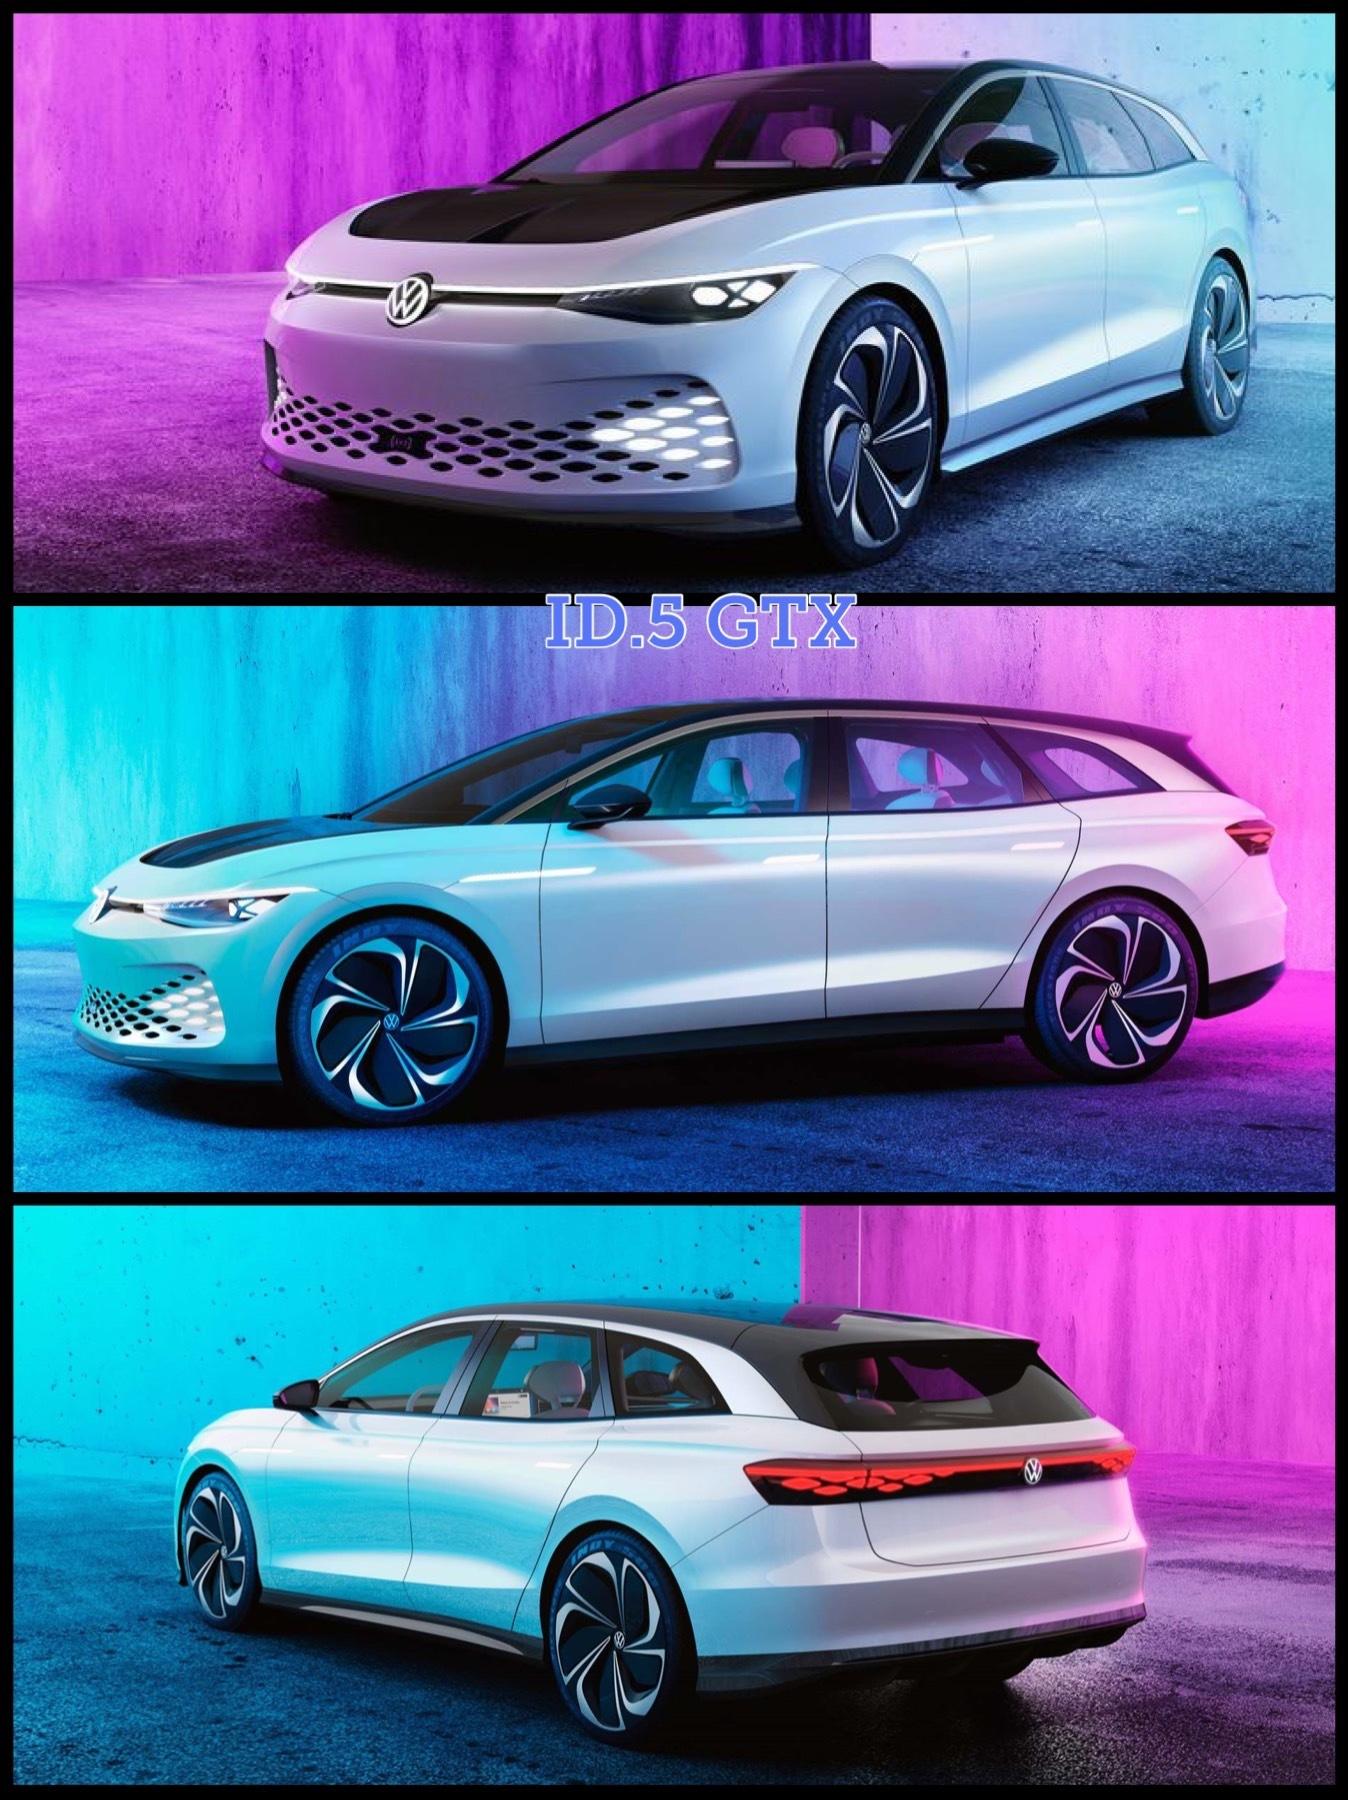 VW「ID.5 GTX」